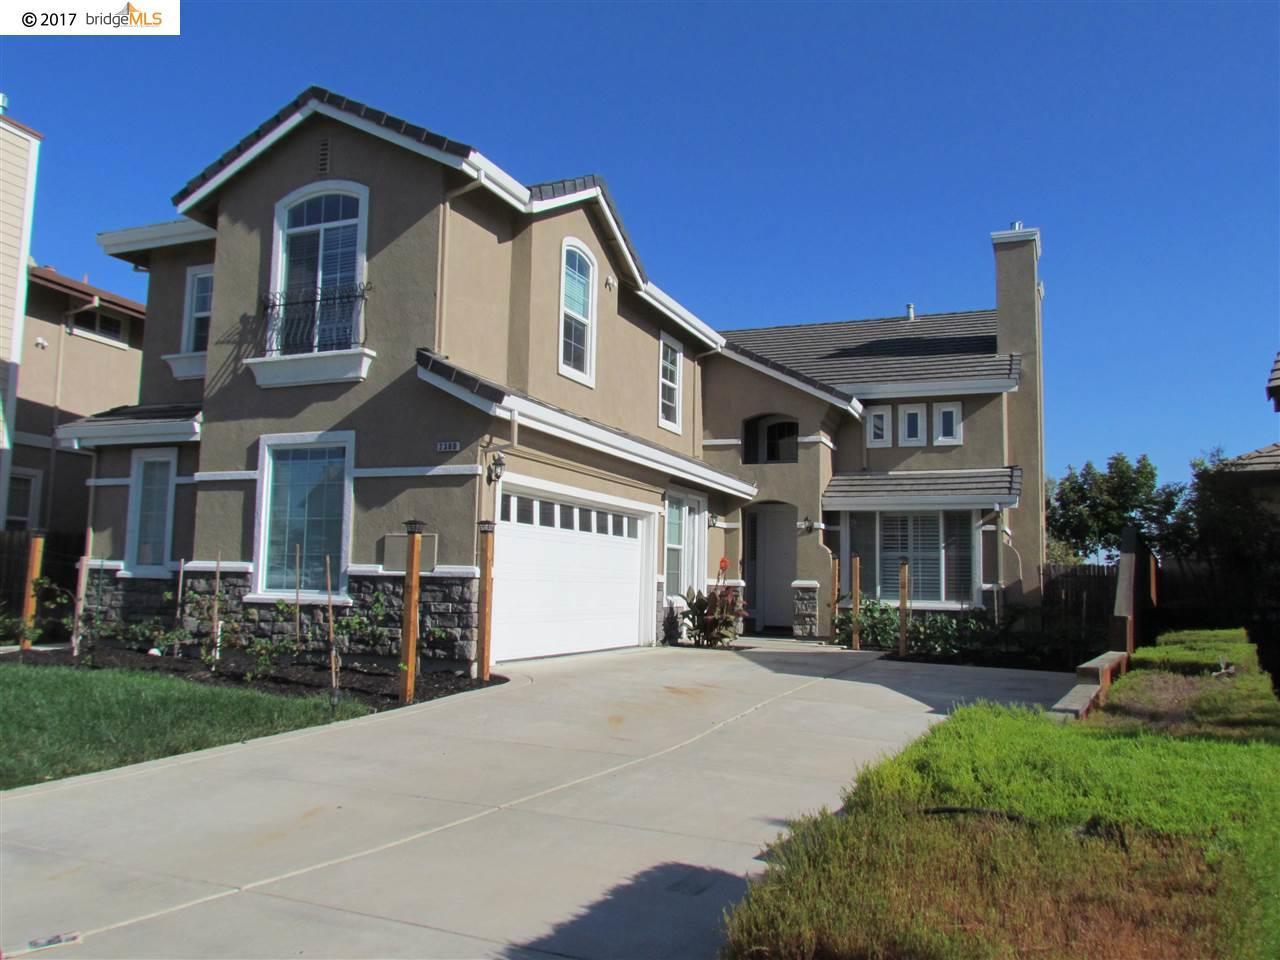 2380 FERNWOOD LN, BRENTWOOD, CA — MLS# 40797803 — Better ...